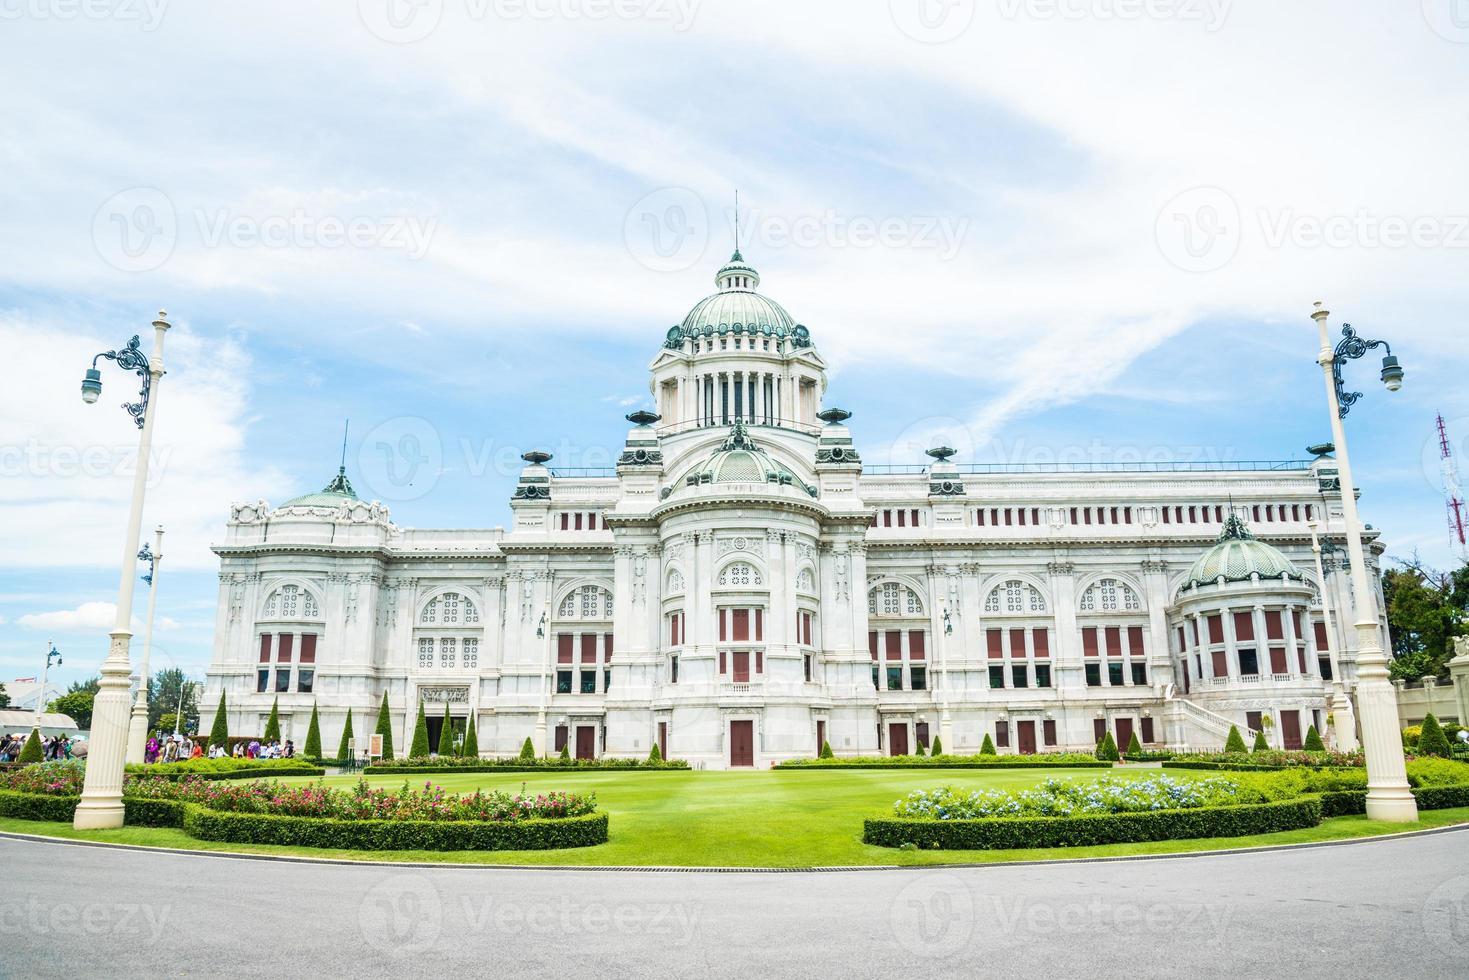 ananta samakhom palace throne hall i thailändska kungliga dusit palace. foto